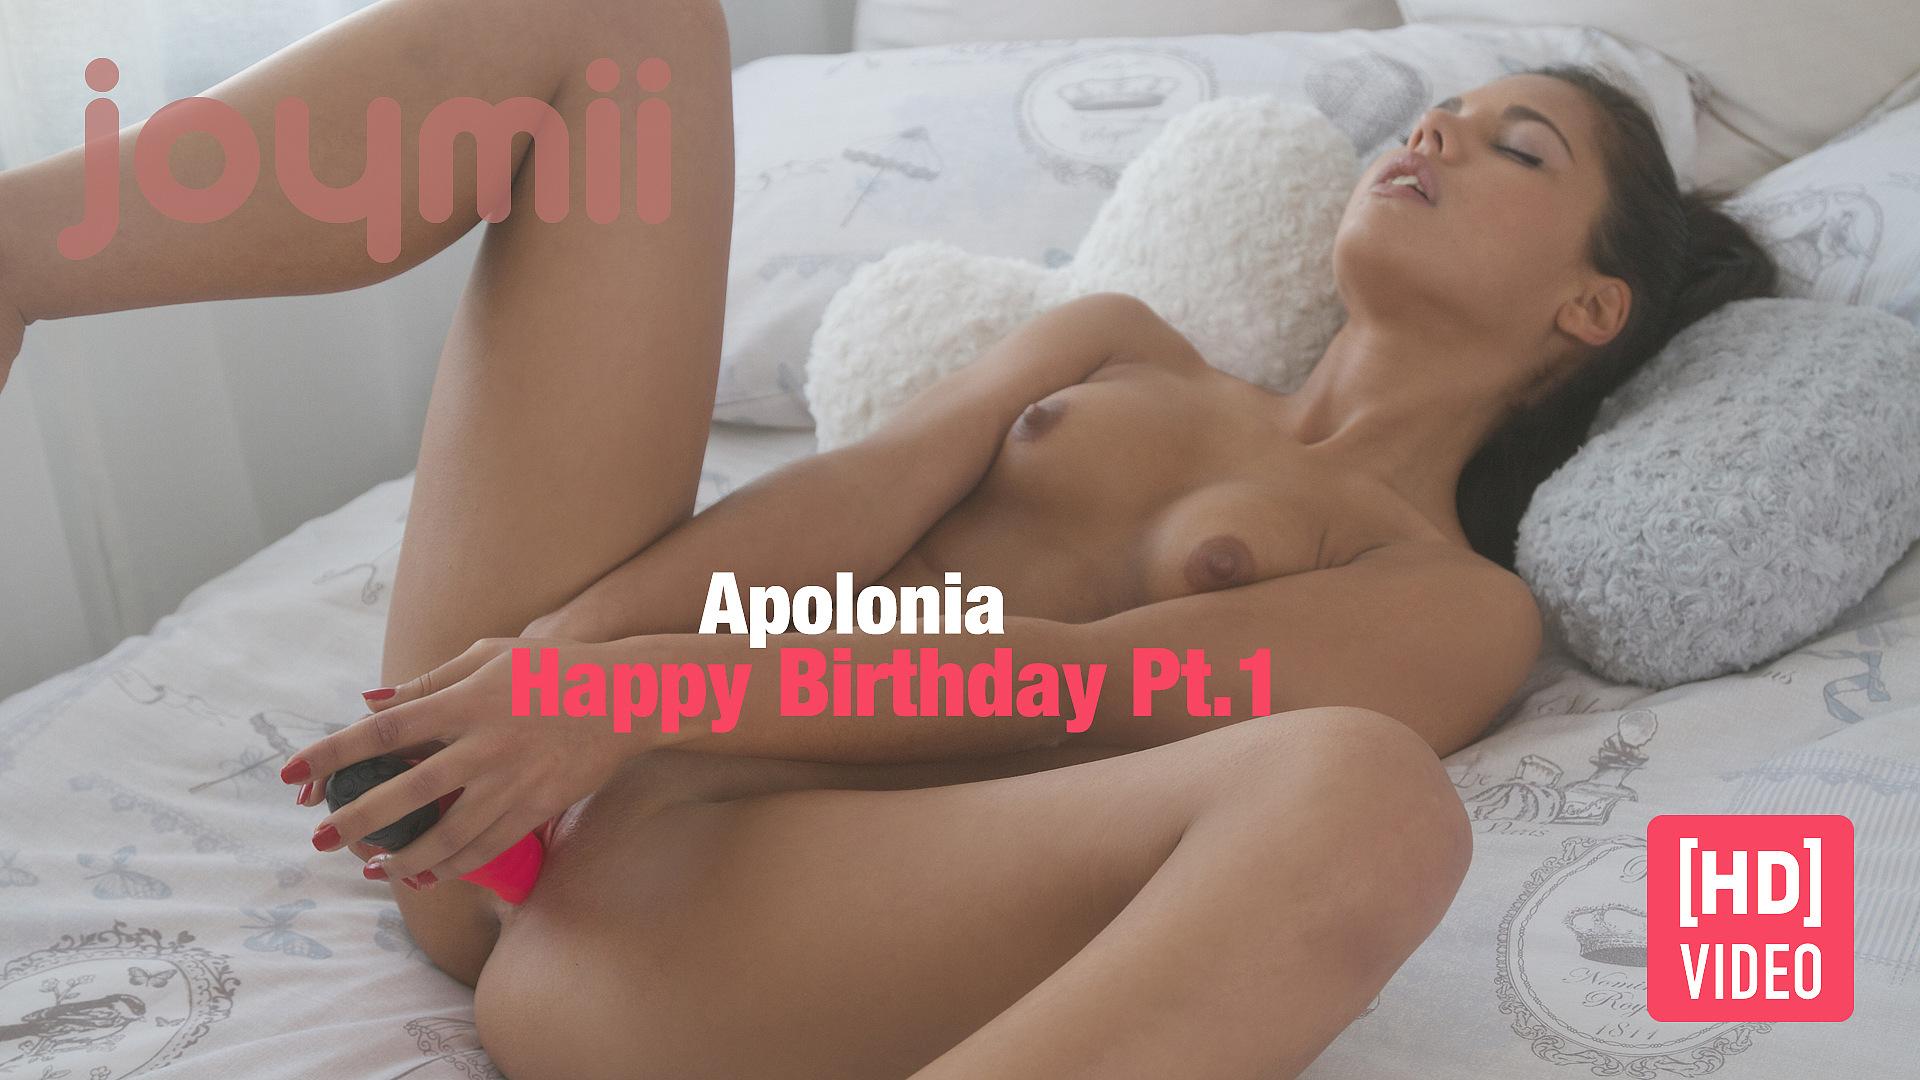 Happy Birthday Pt. 1